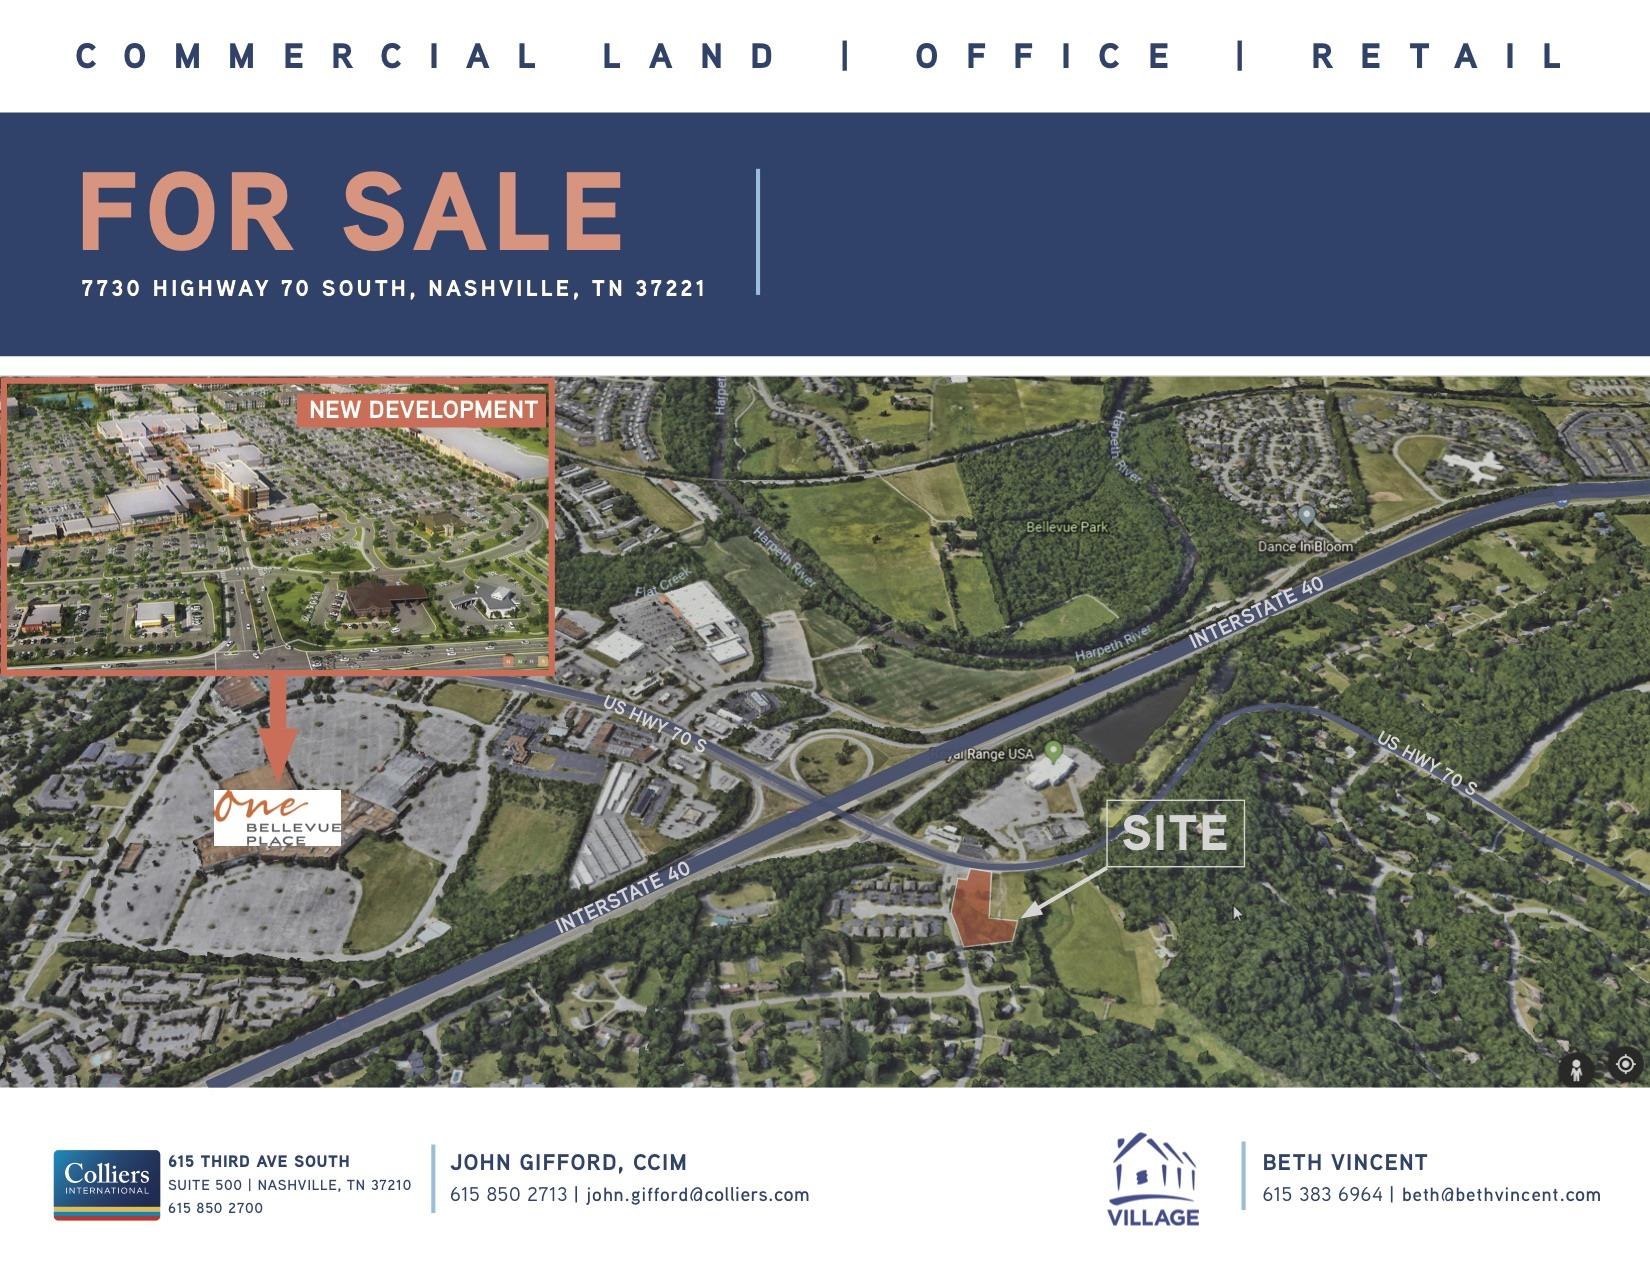 7730 Hwy 70 South, S, Nashville, TN 37221 - Nashville, TN real estate listing